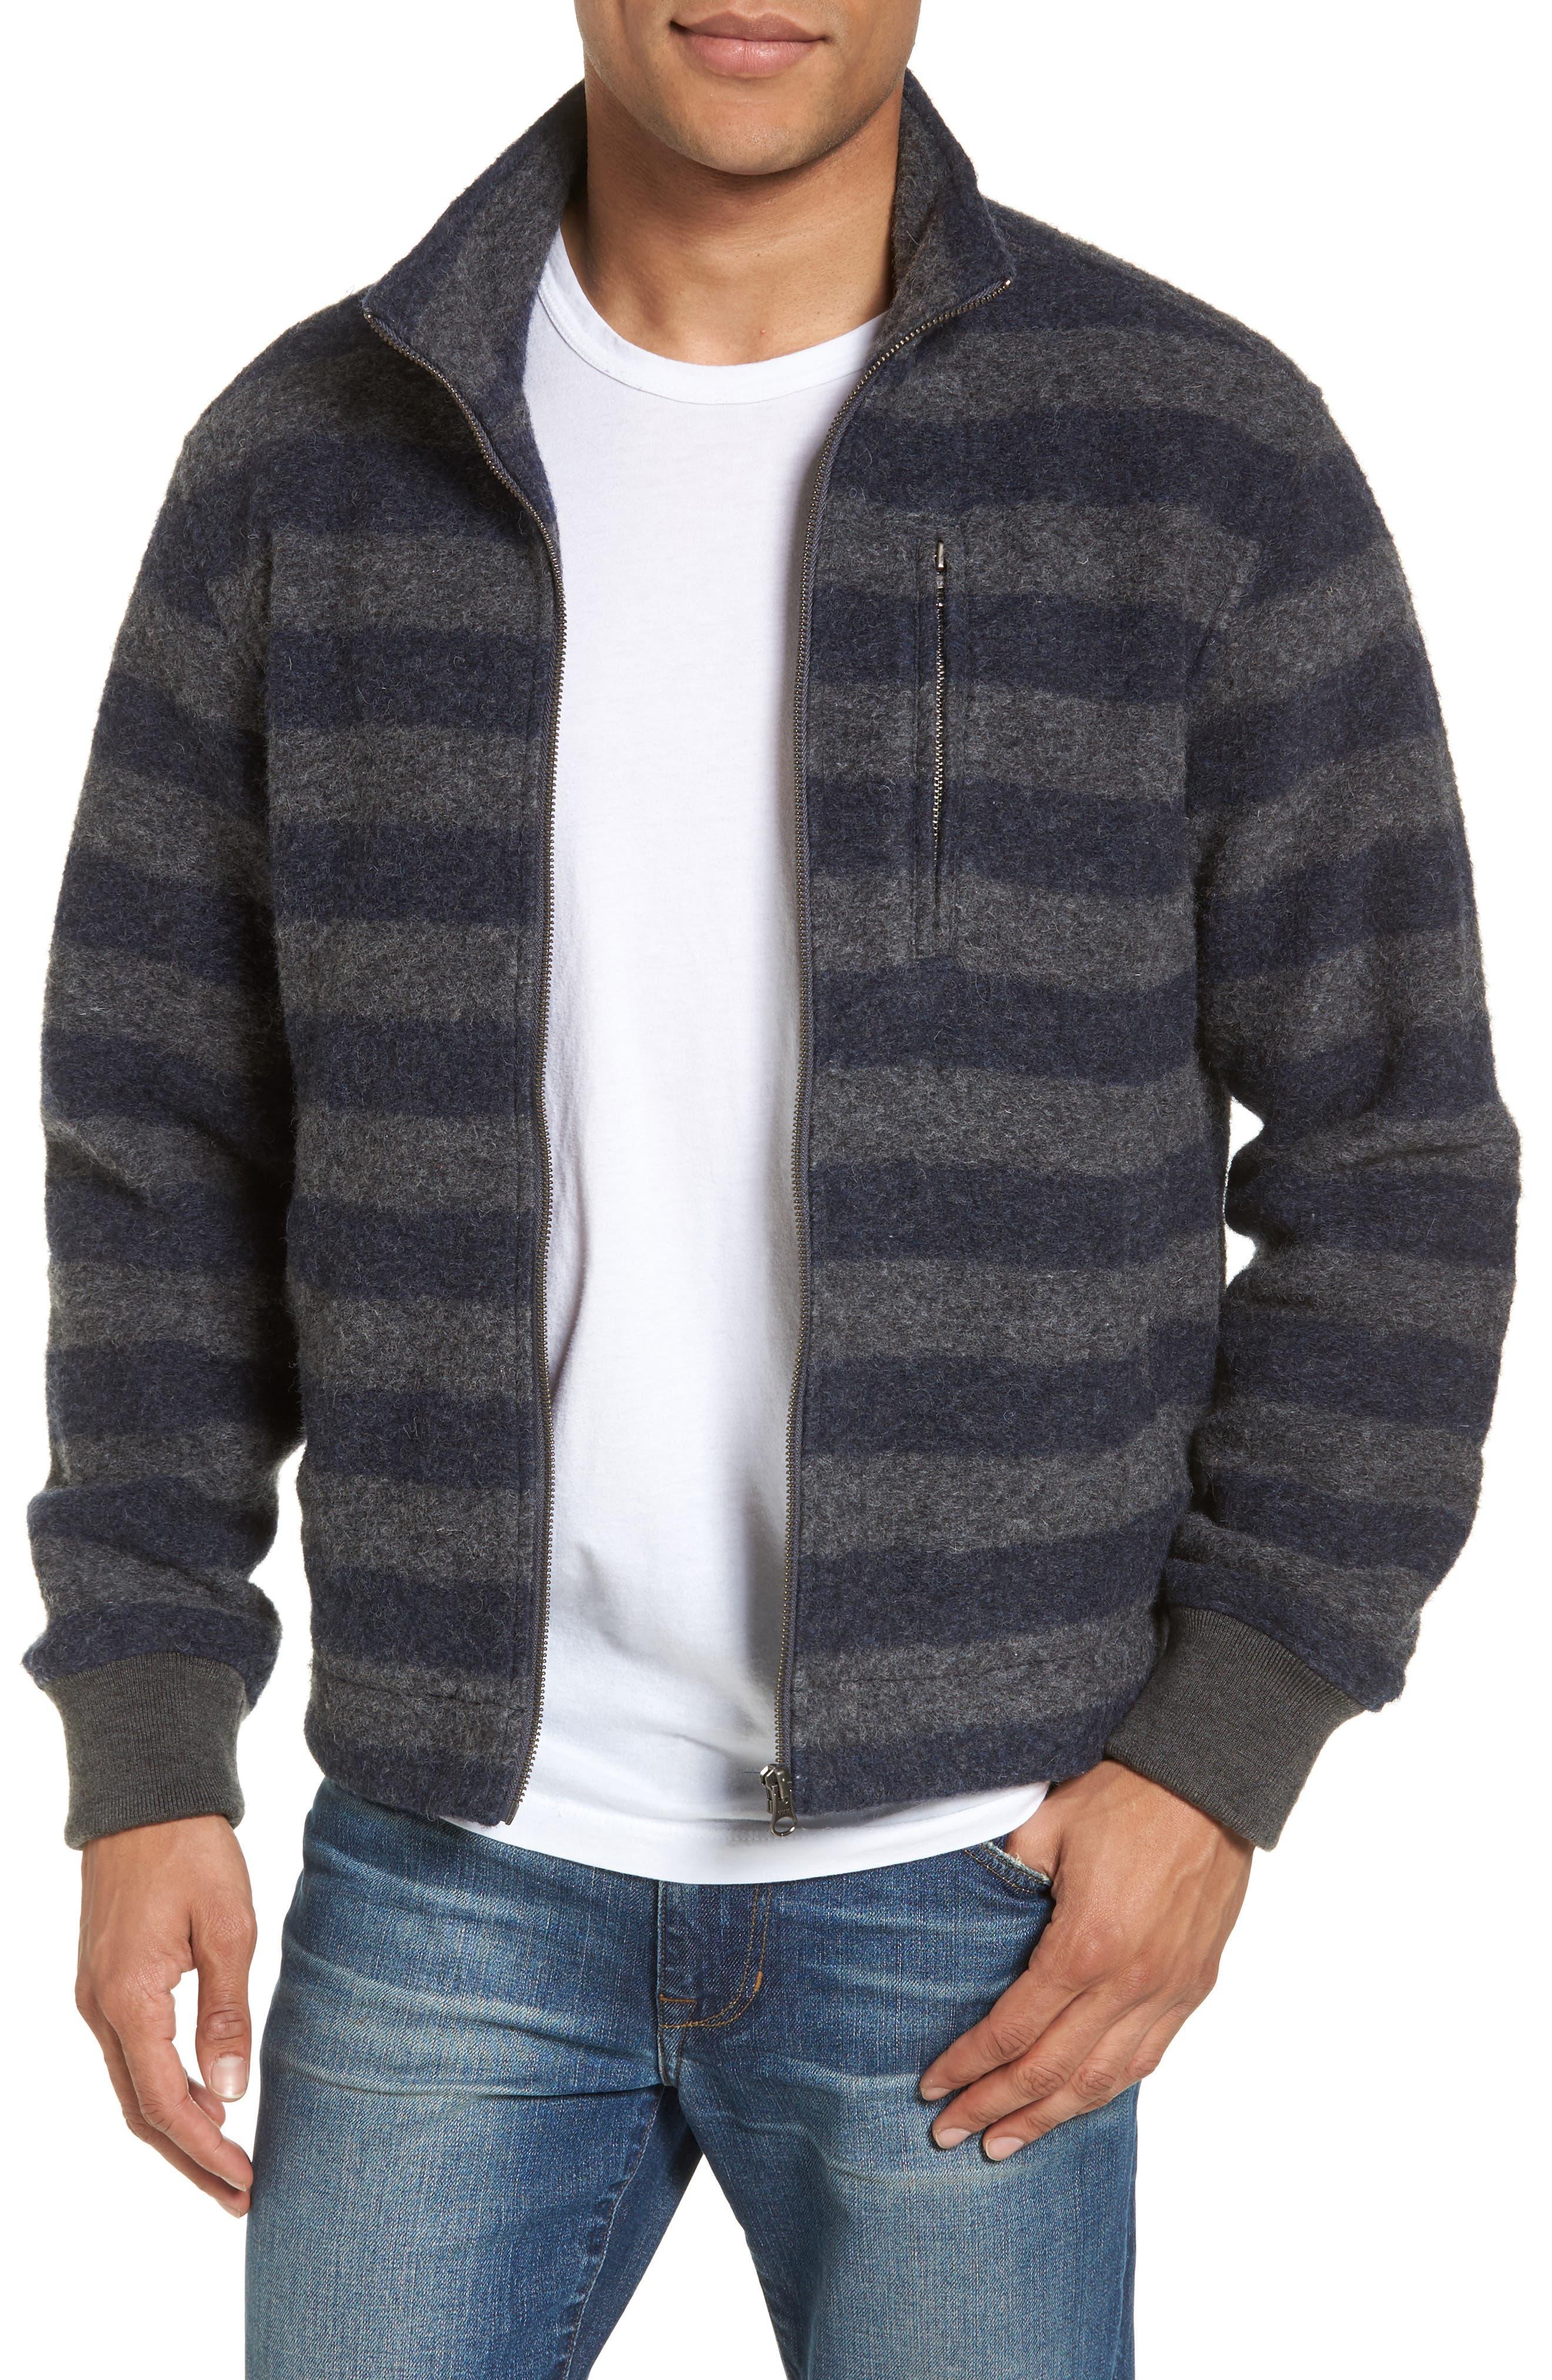 Main Image - Grayers Bowen Stripe Zip Front Jacket